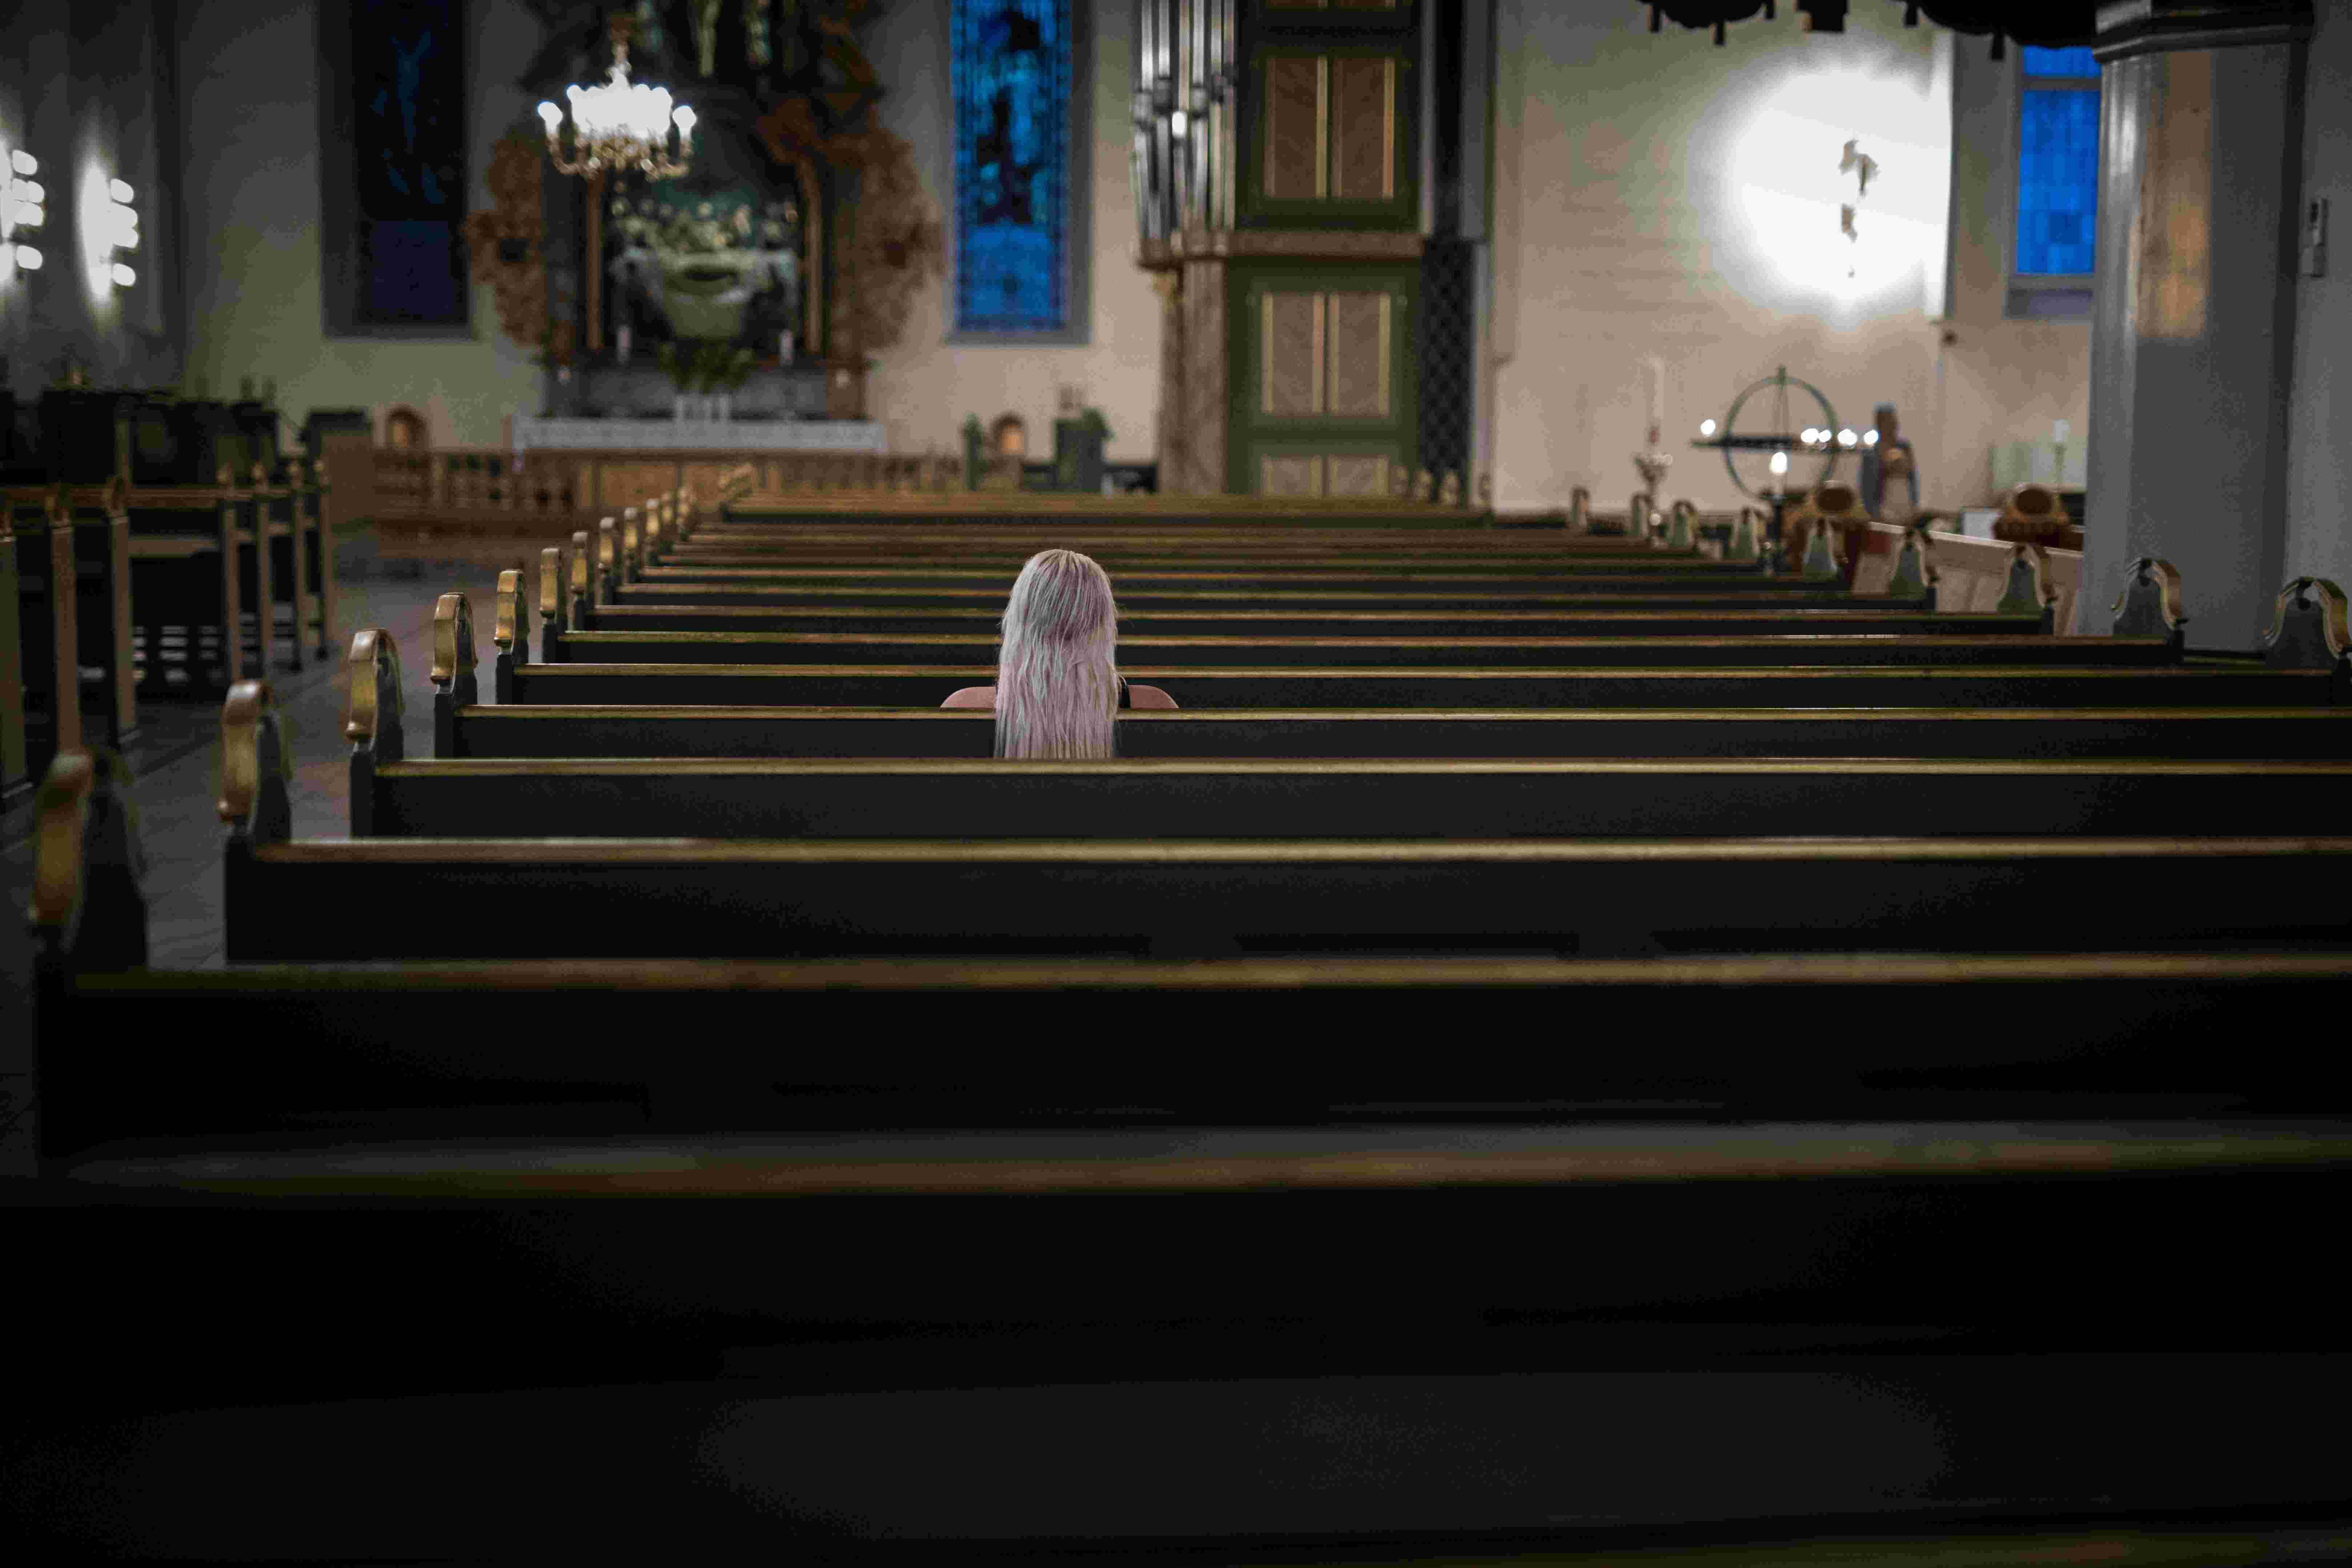 Jente sitter alene i kirkebenk